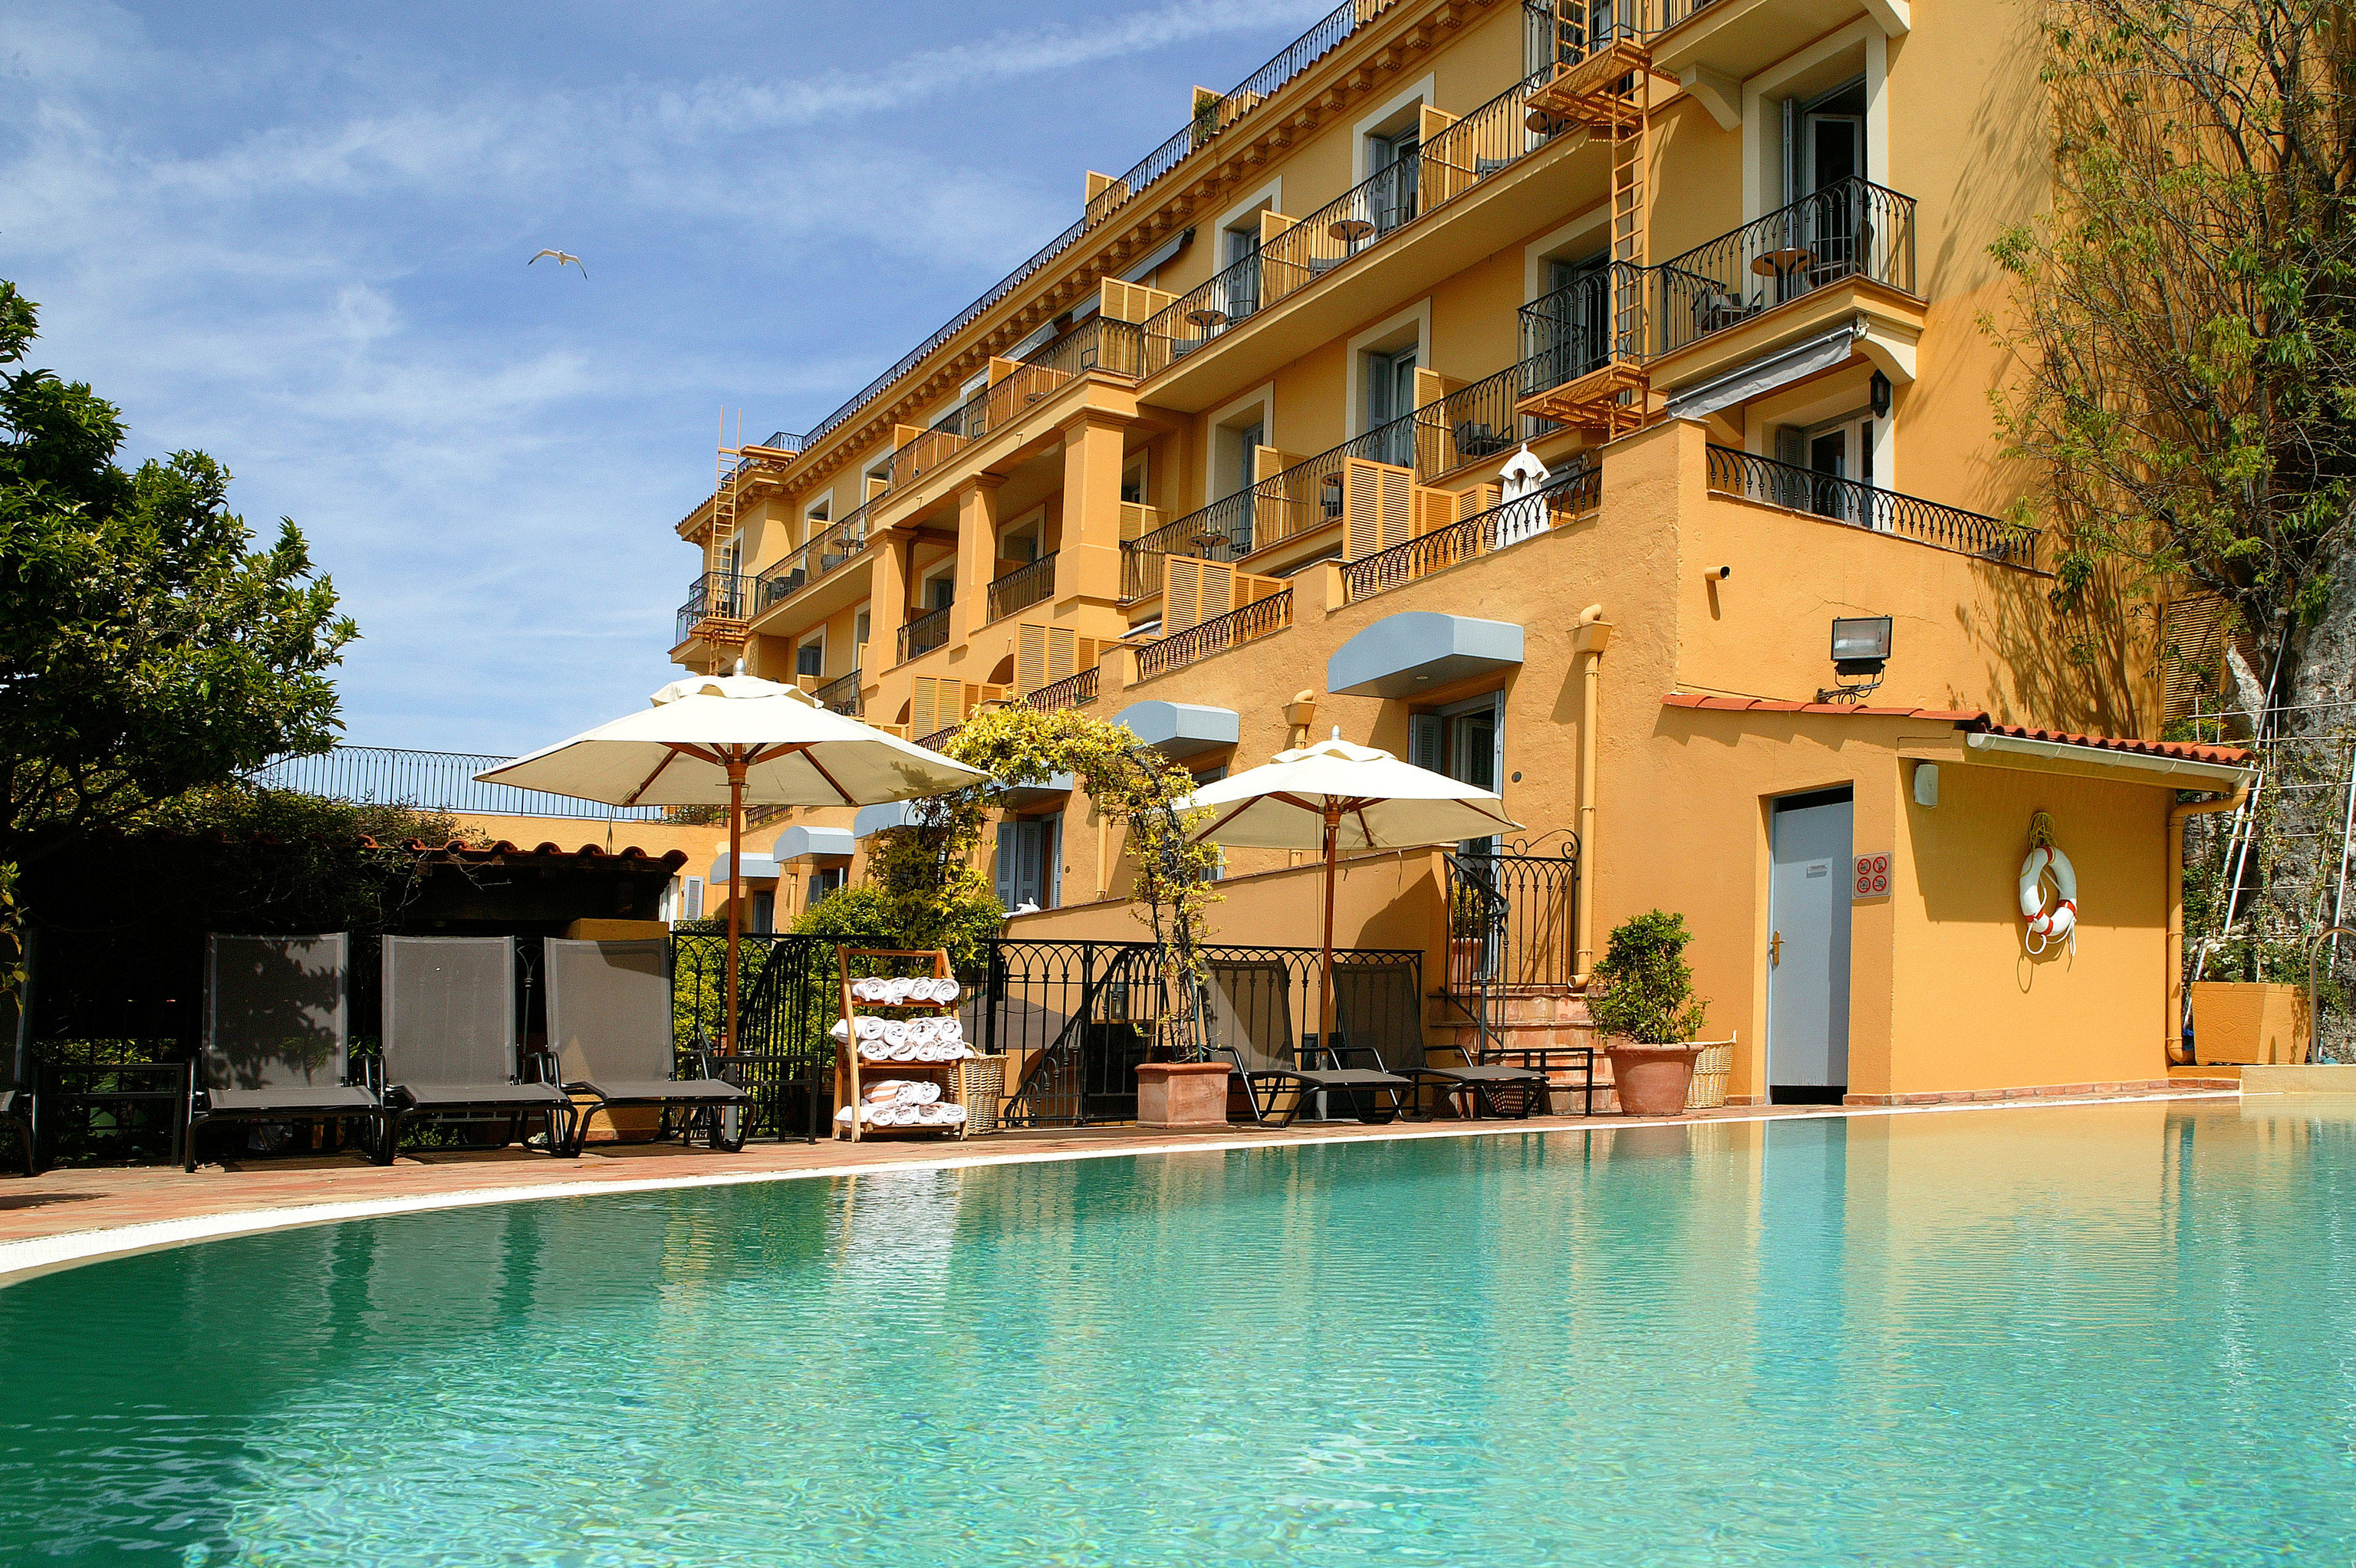 building water property house swimming pool Resort condominium Pool Villa home resort town mansion swimming